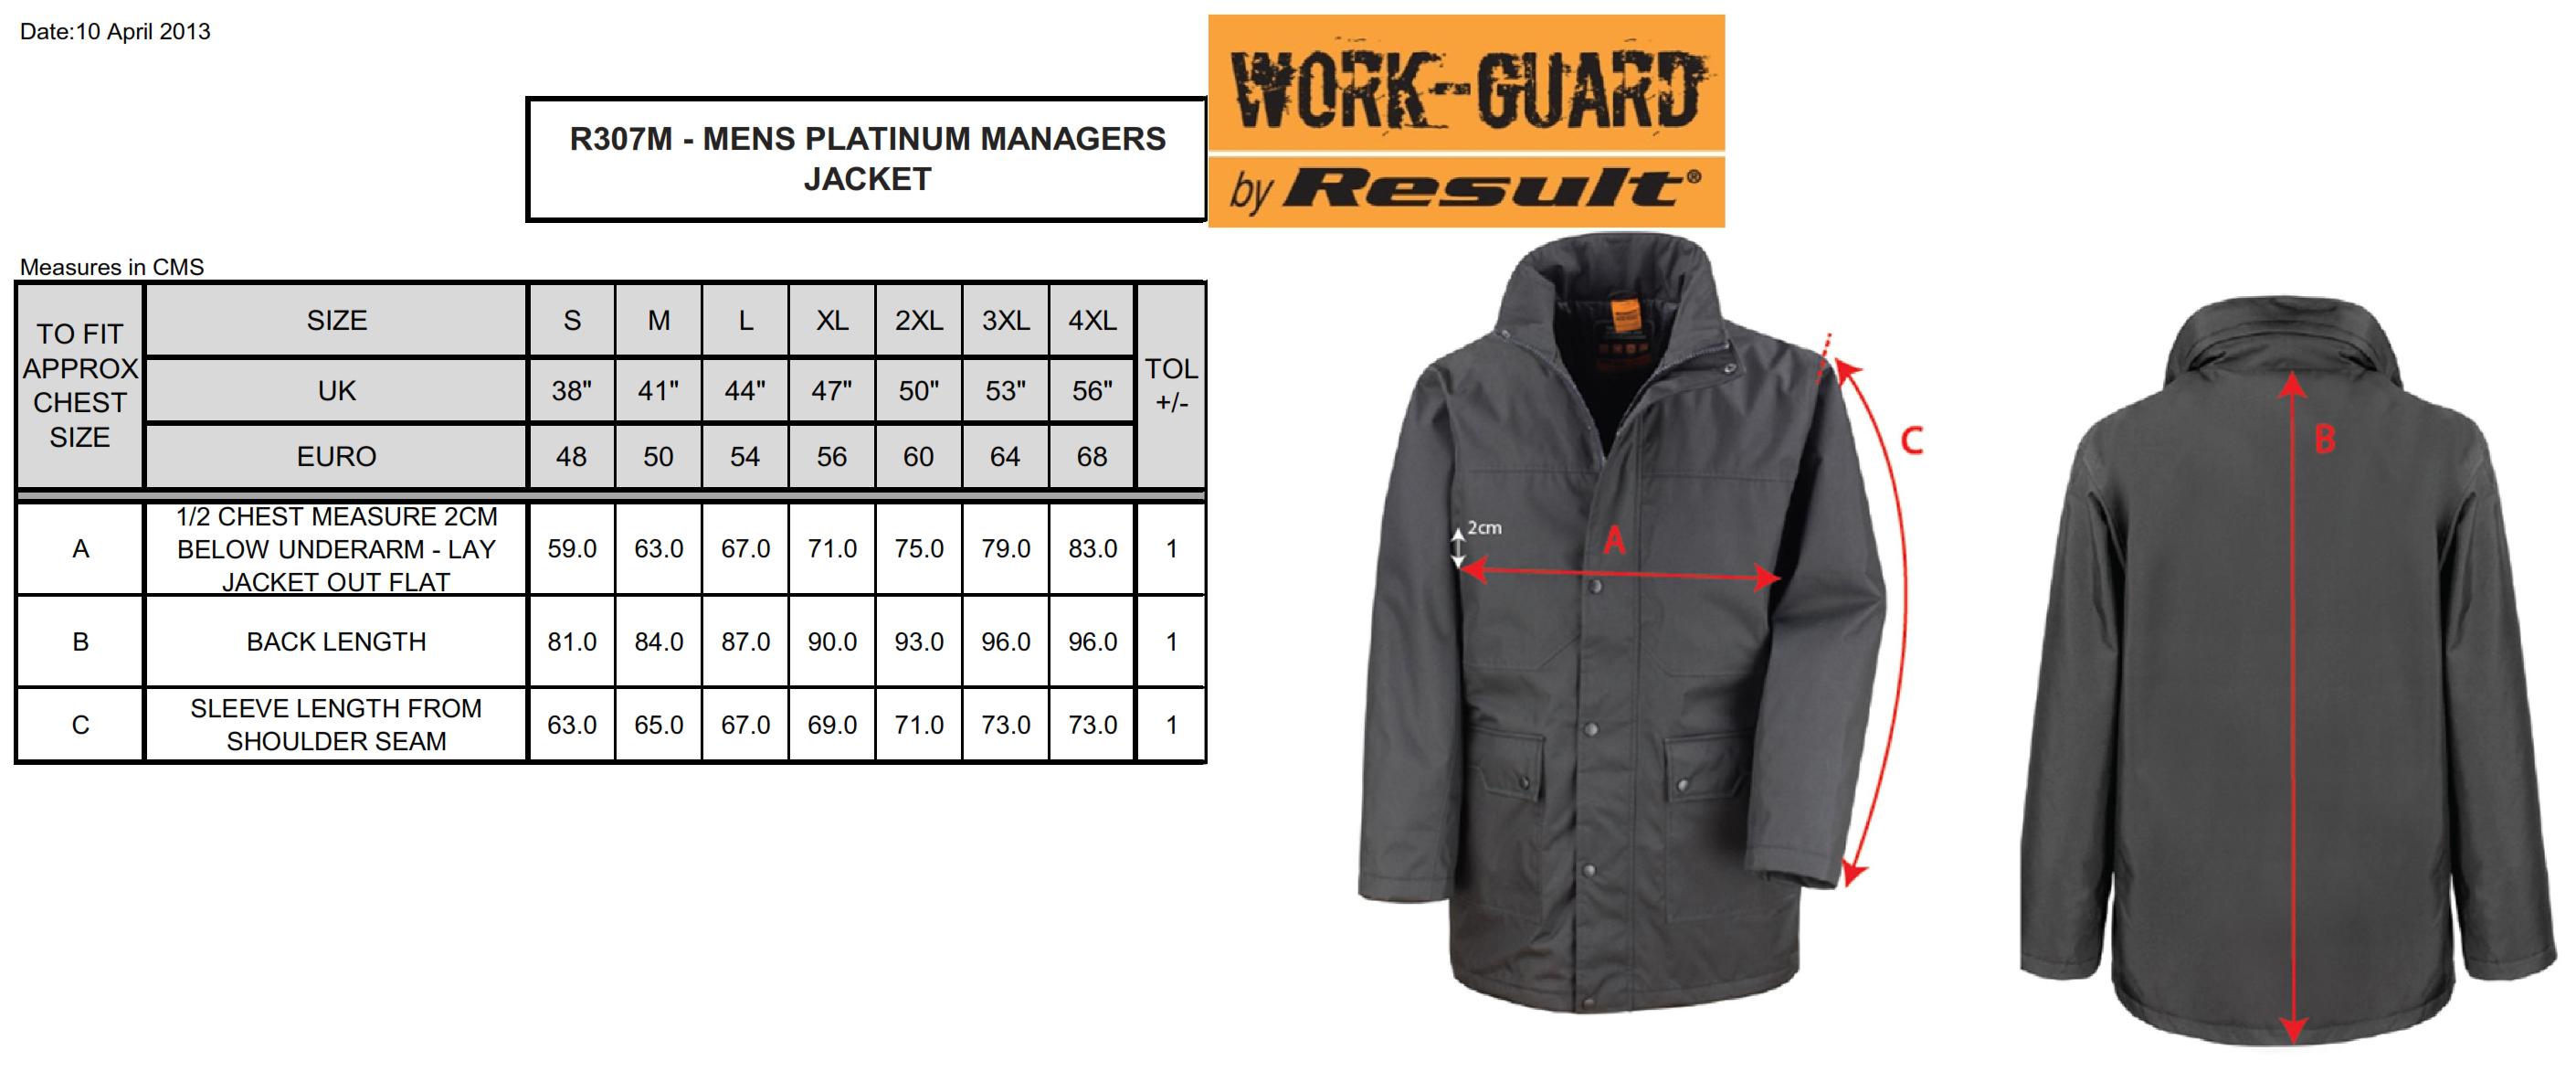 Result: Platinum Managers Jacket R307M